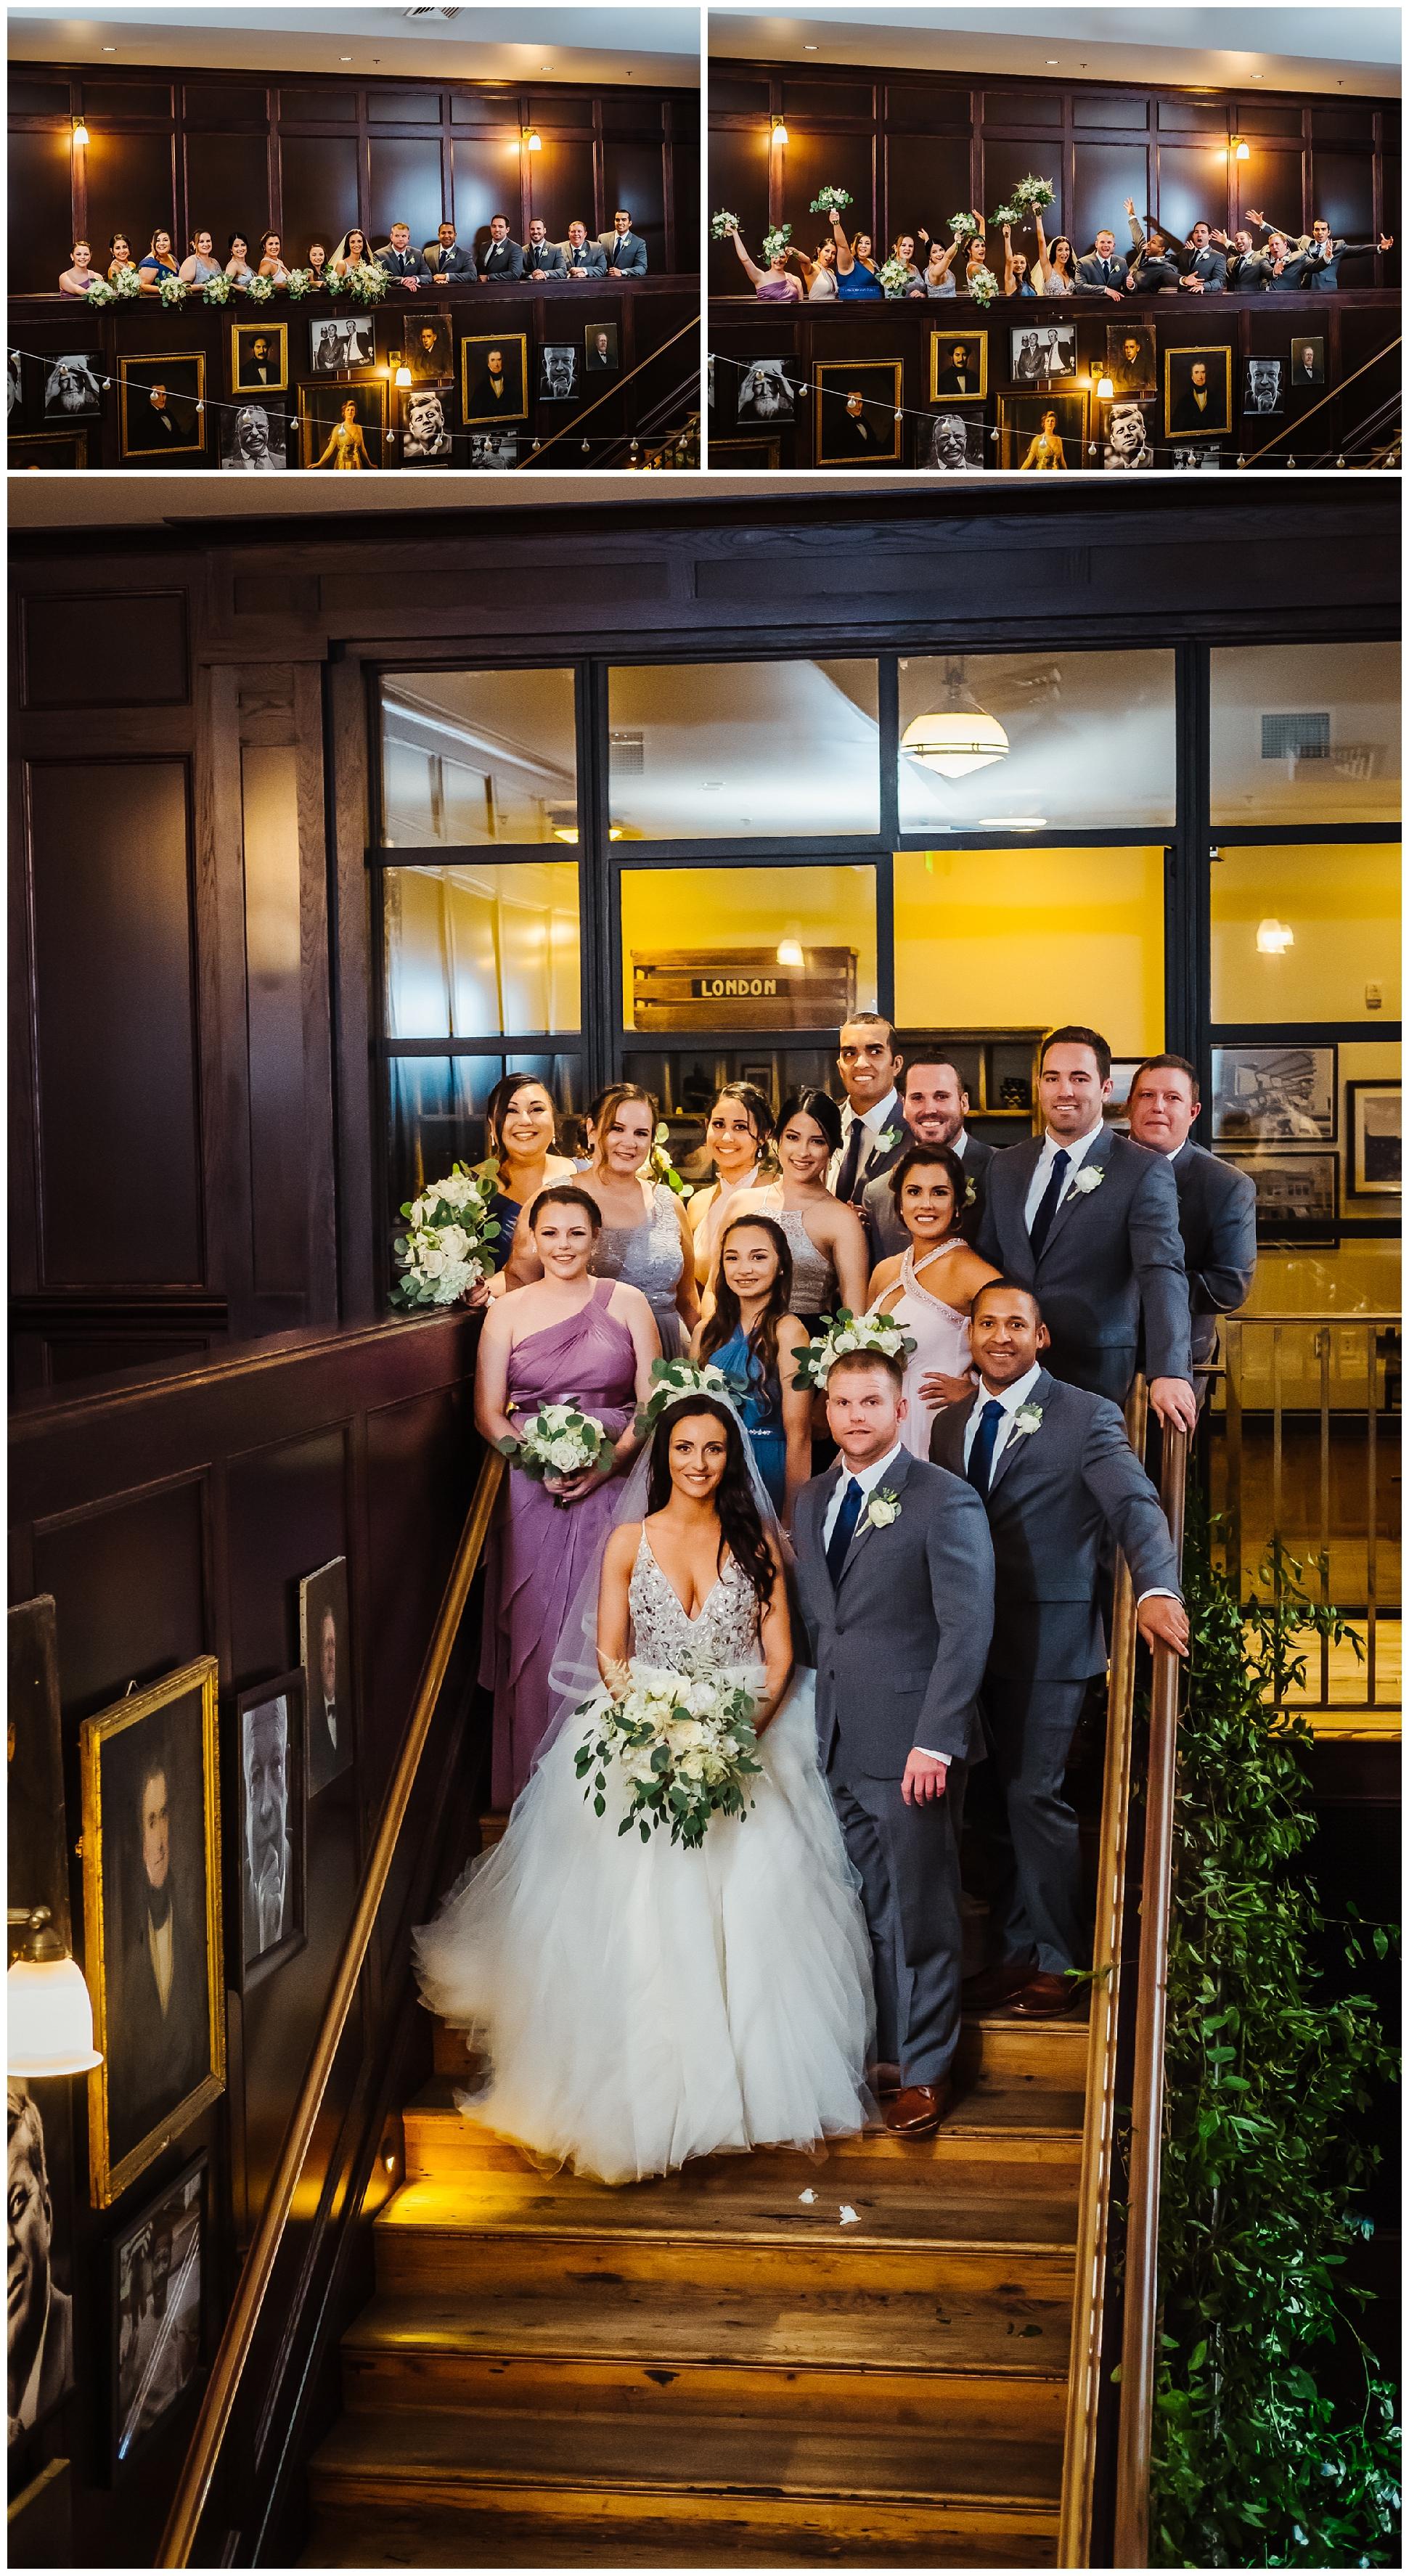 tampa-wedding-photographer-oxford-exchange-garland-candlelight-gold-hayley-paige_0038.jpg